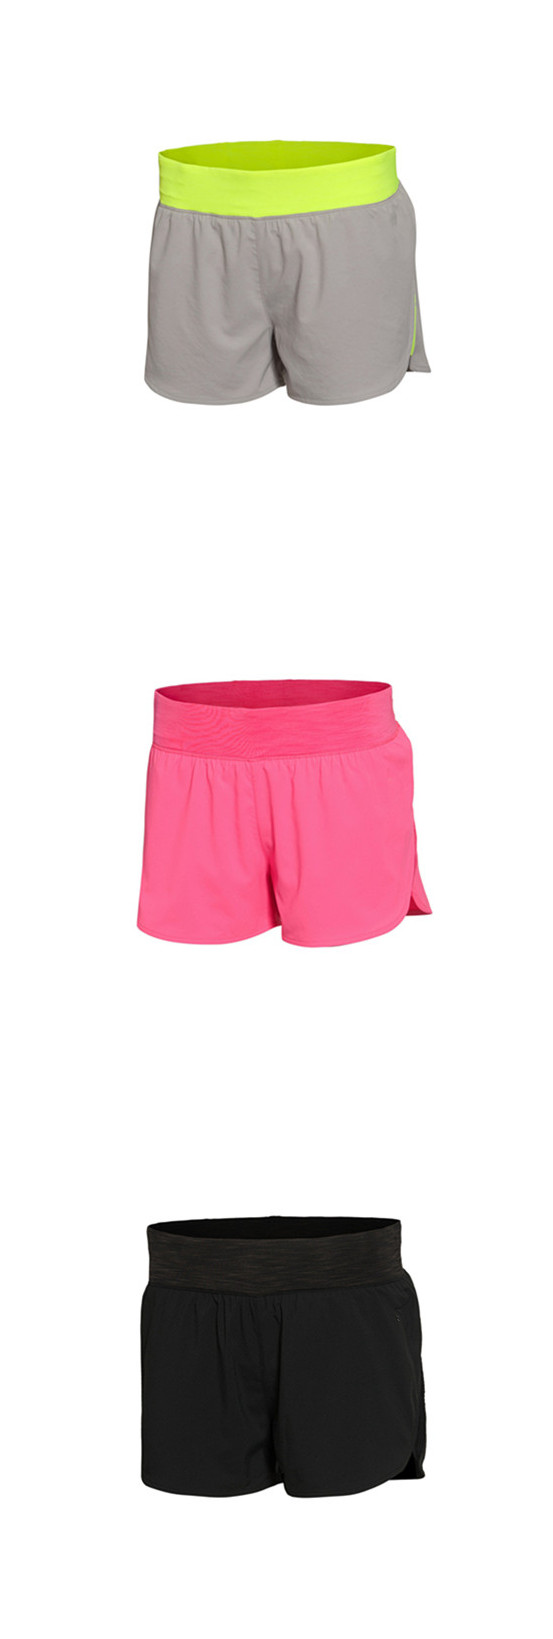 Wholesale Breathable Women Sports Wear Running Shorts